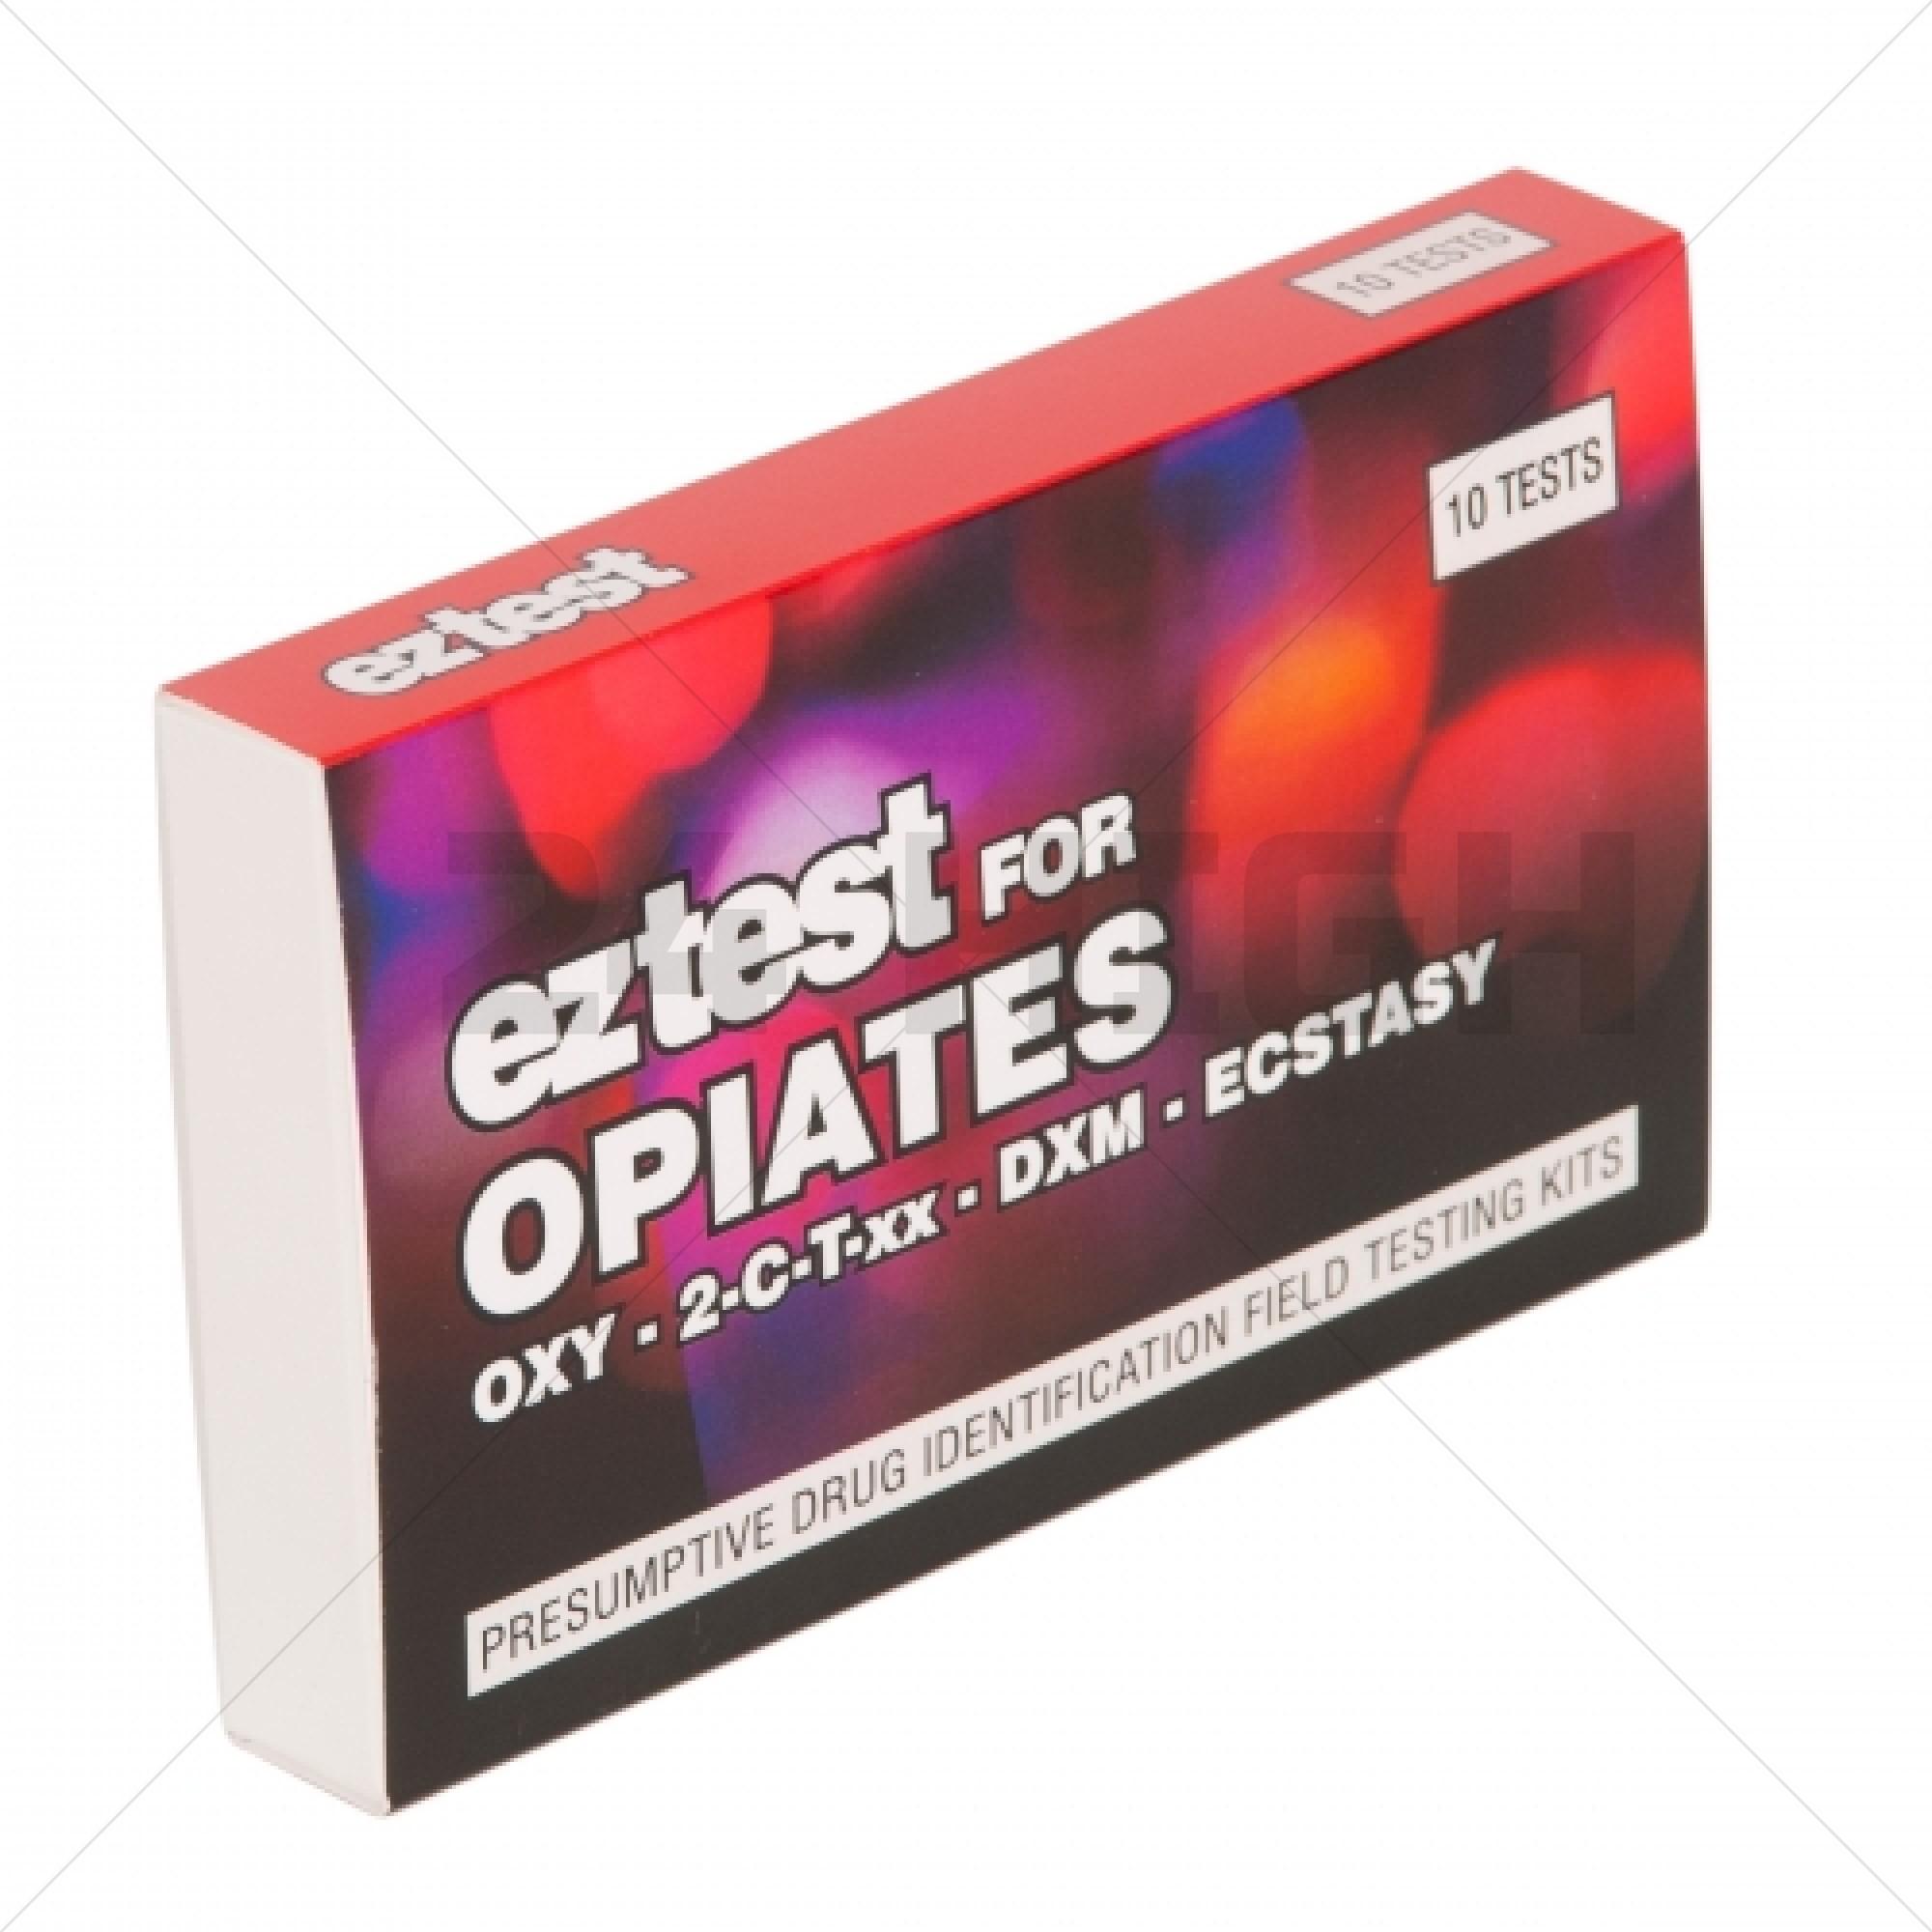 EZ Test for Opiates